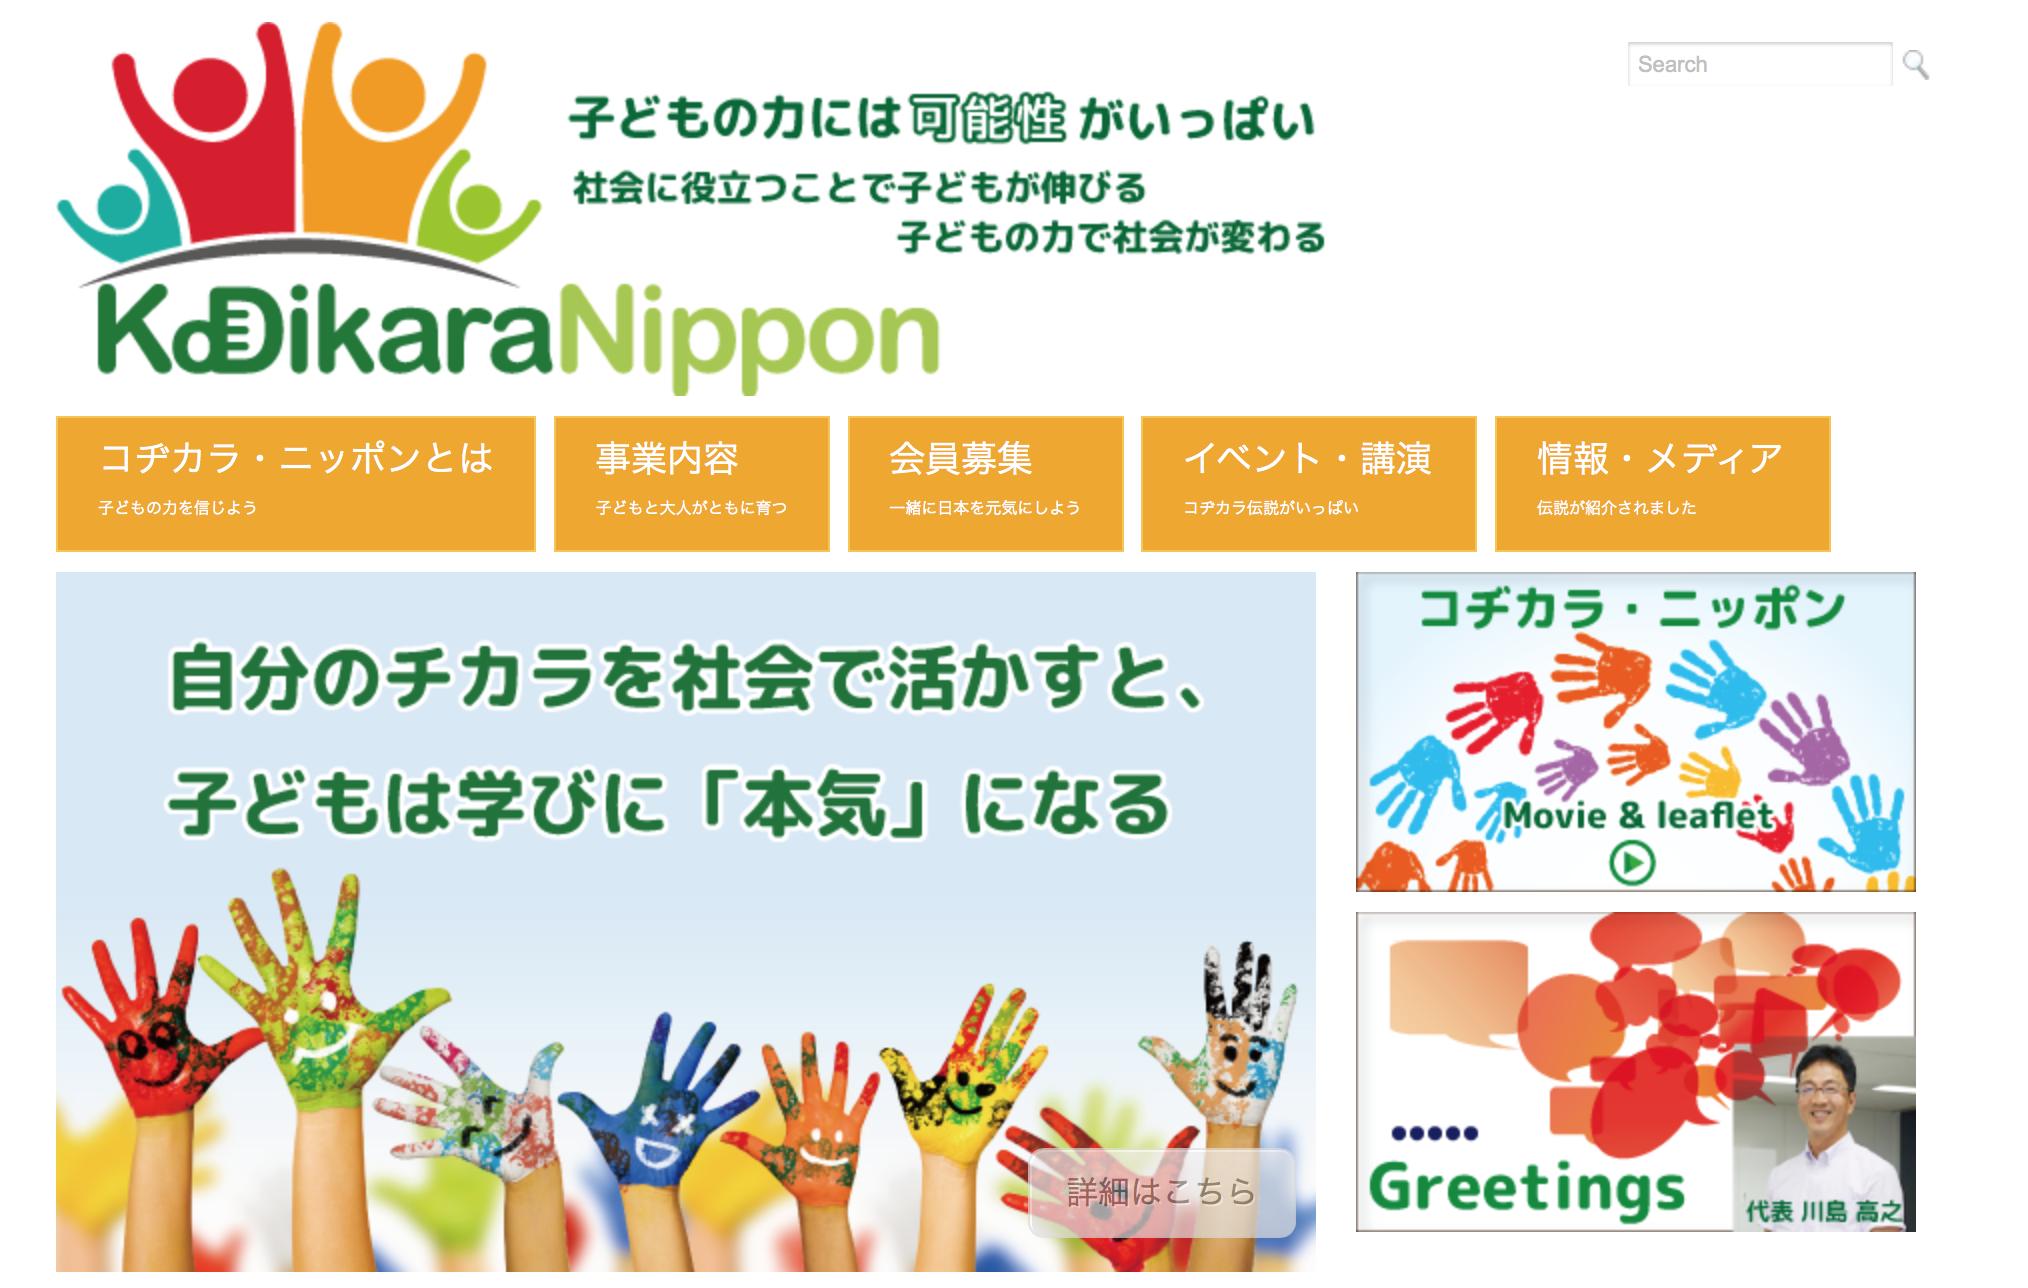 NPO法人コヂカラ・ニッポンの年次総会〜コヂカラのプロジェクトは興味深いものばかり